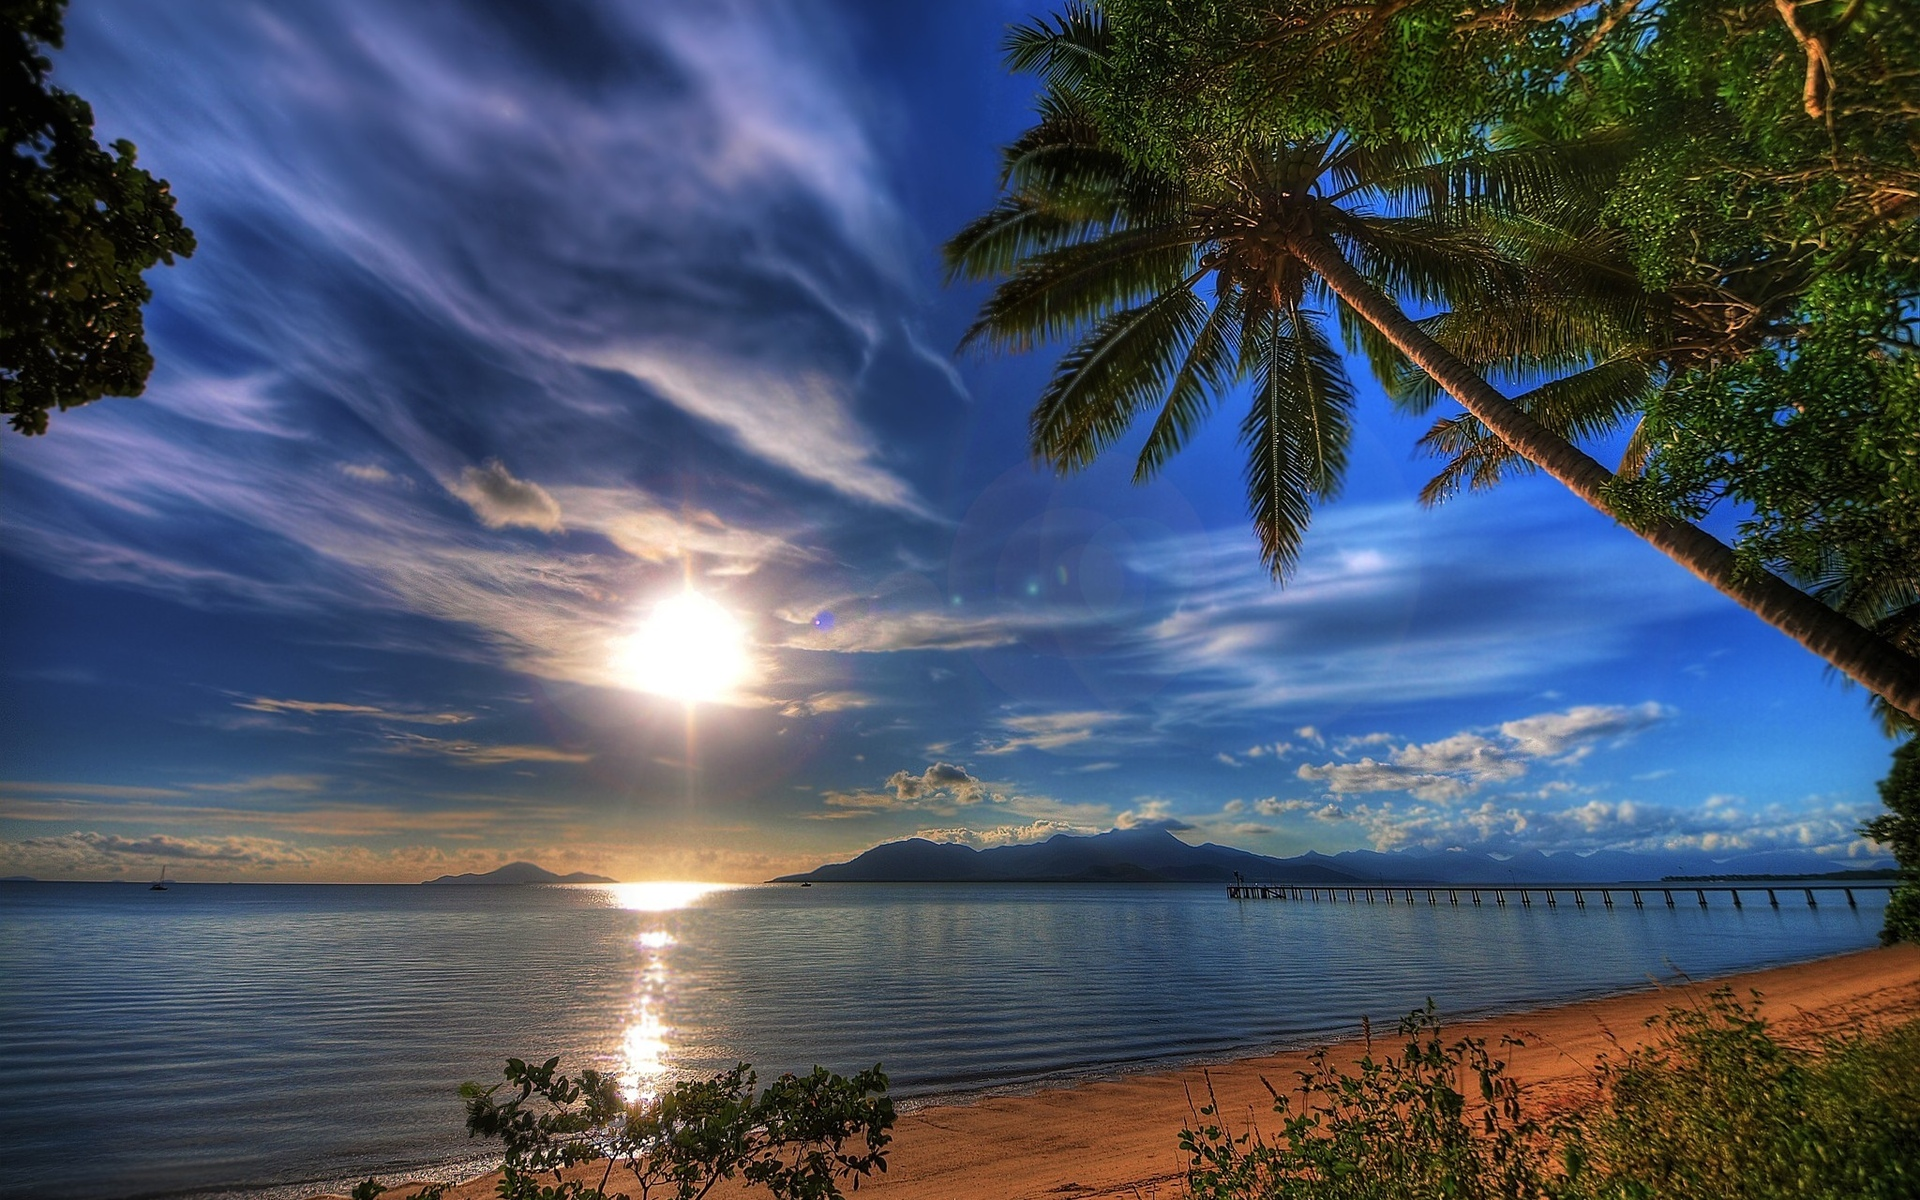 вечерний пейзаж на море картинки ефремова